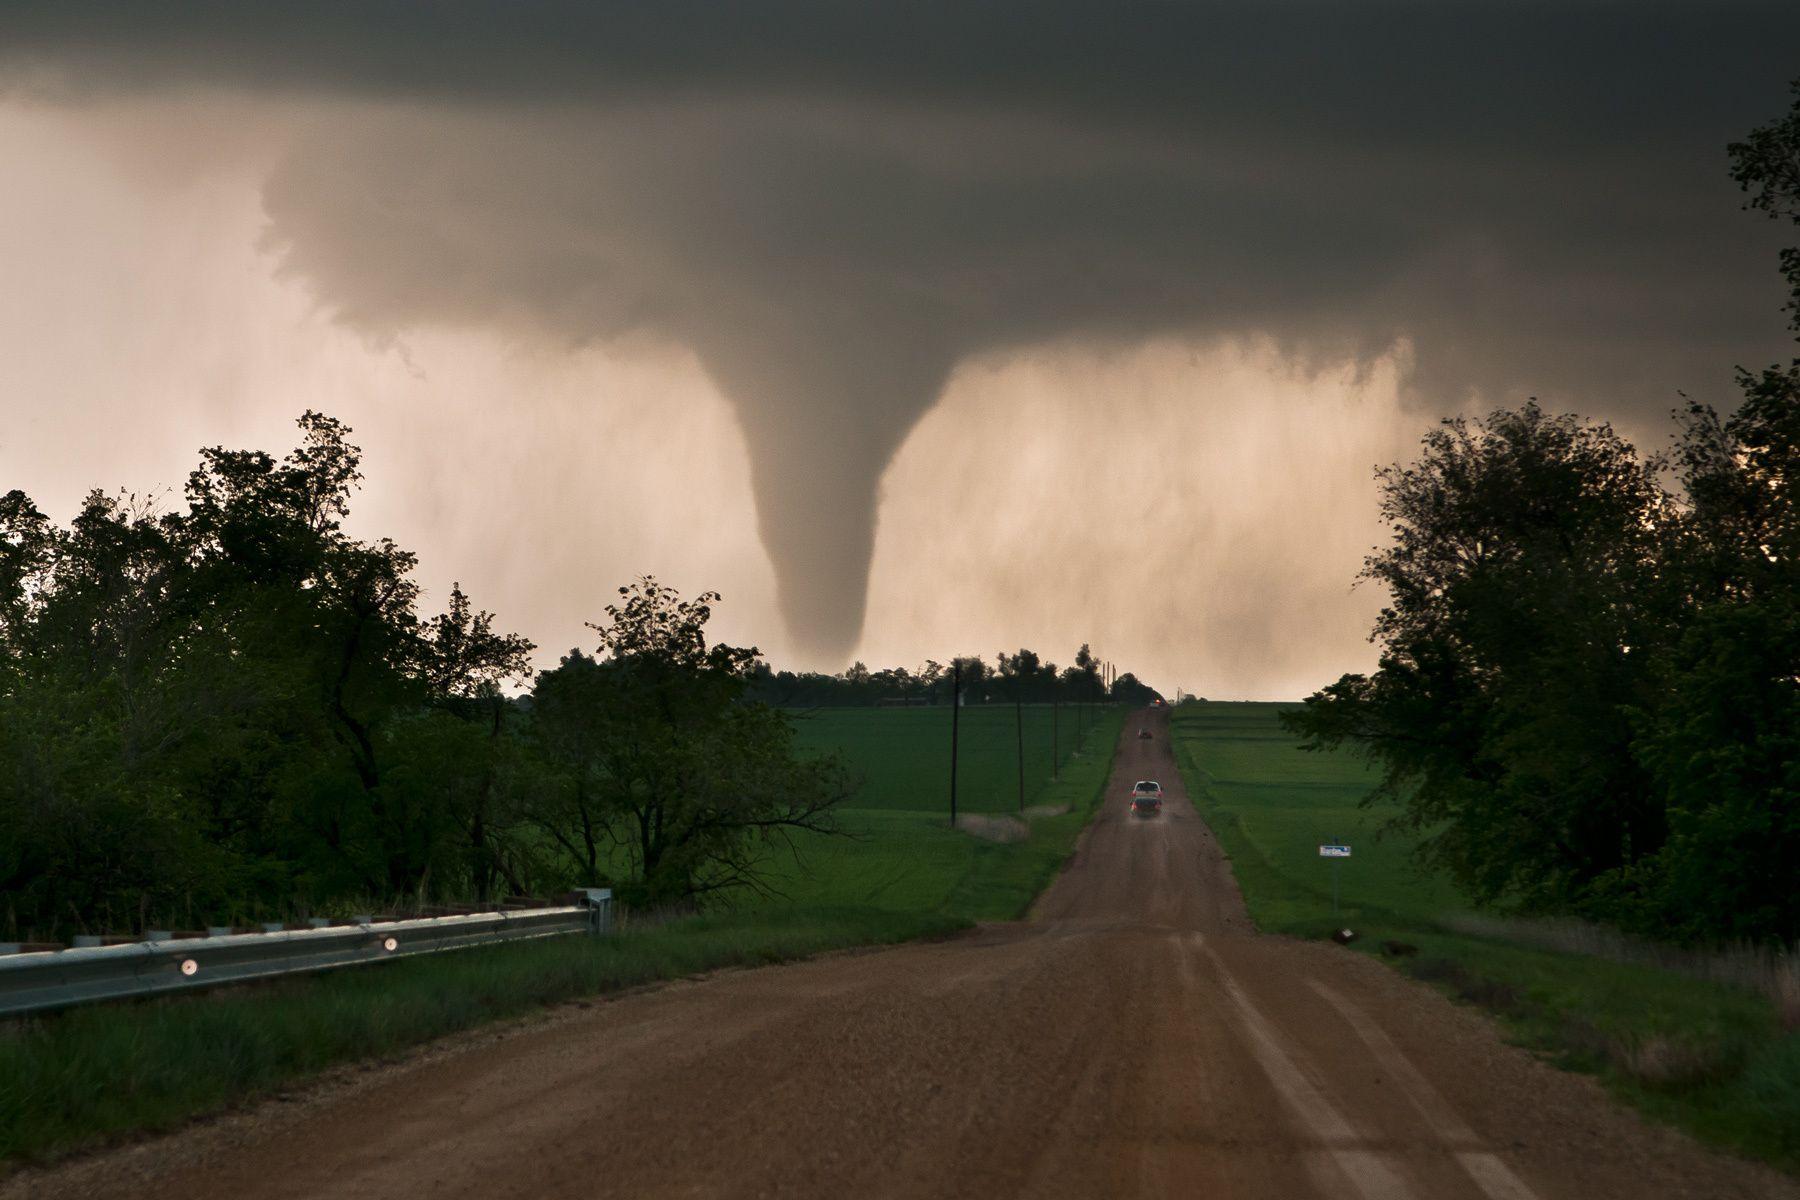 April 14, 2012 - Near Solomon, Kansas